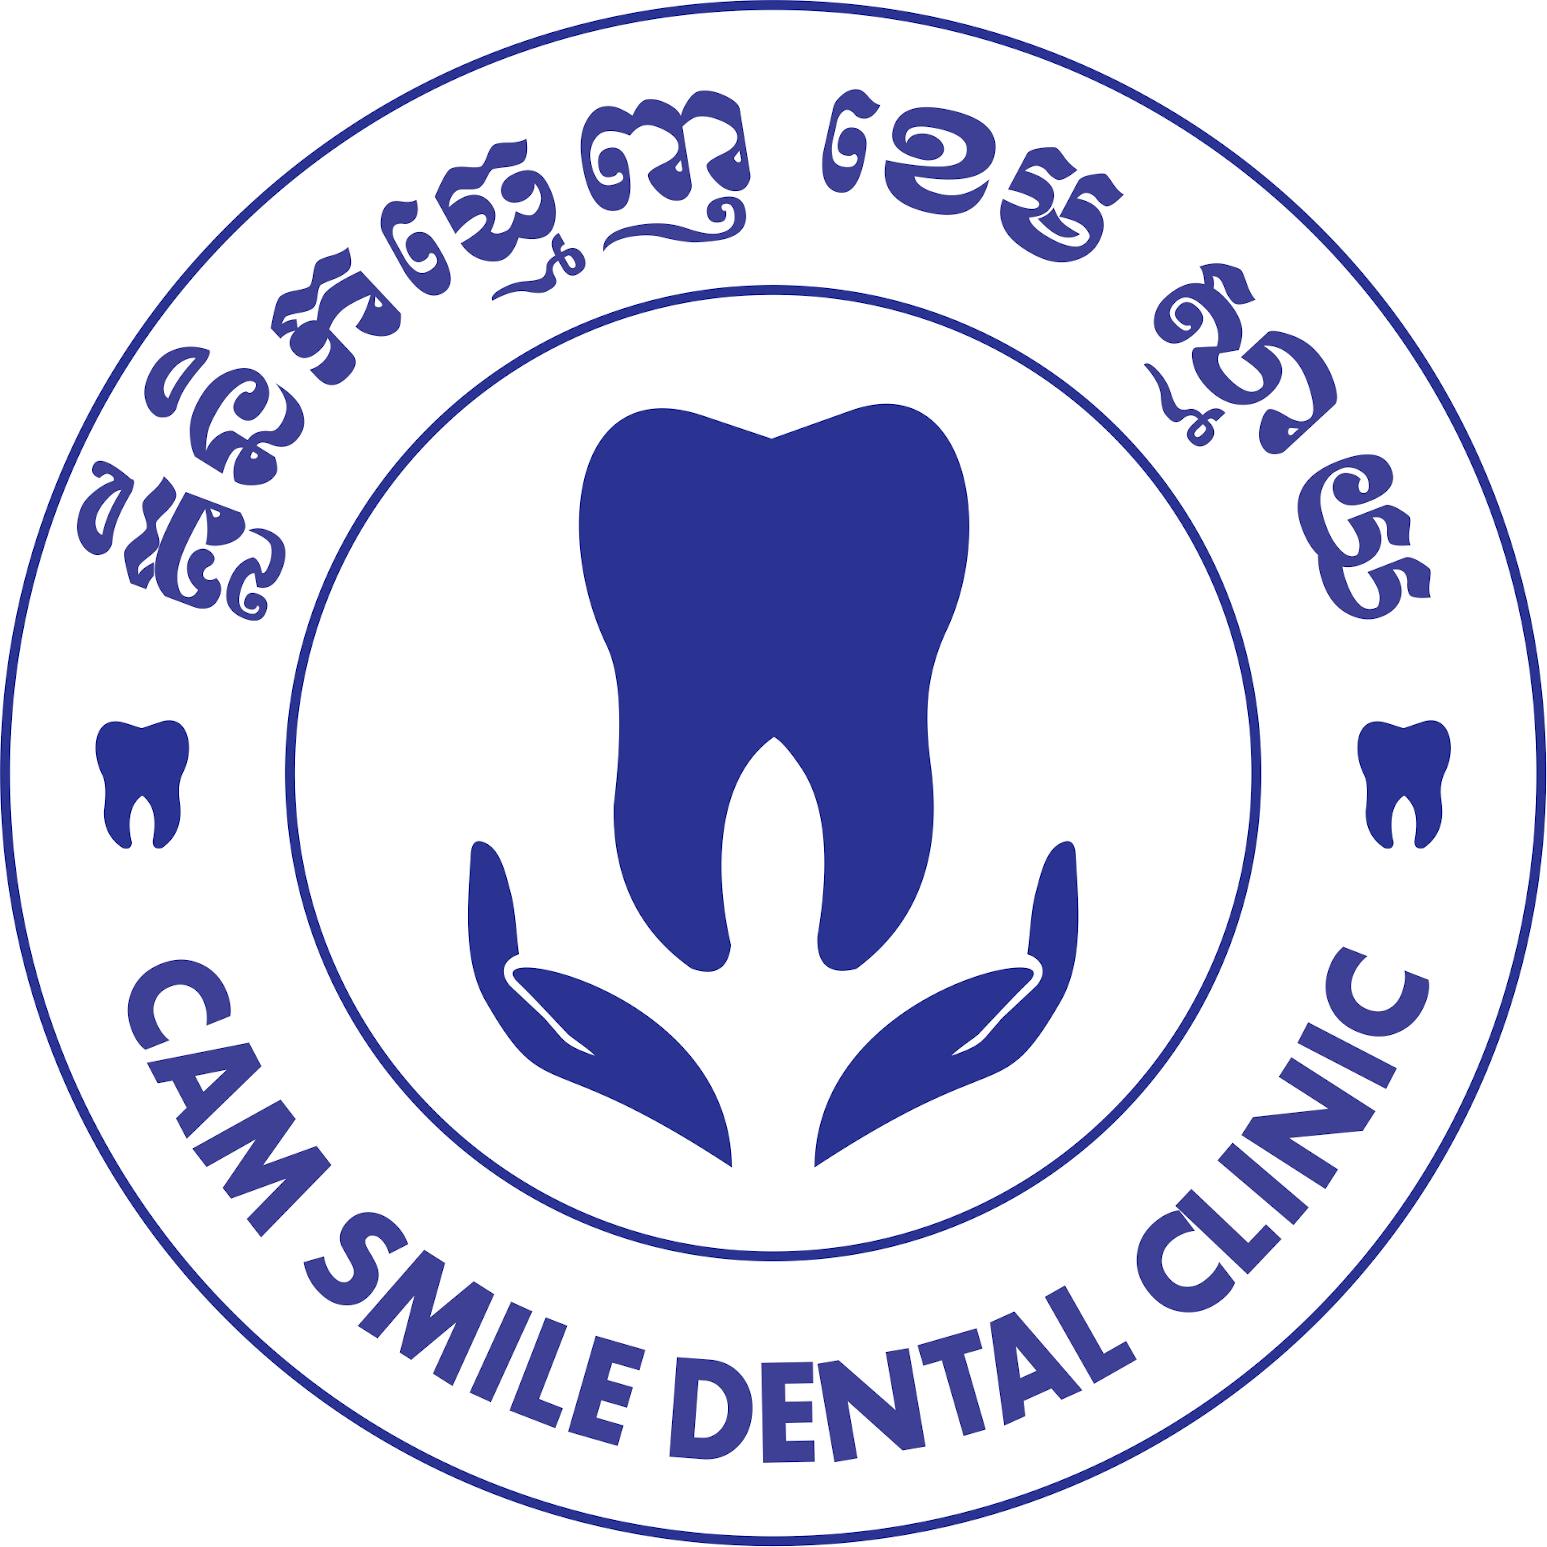 Cam Smile Dental Clinic